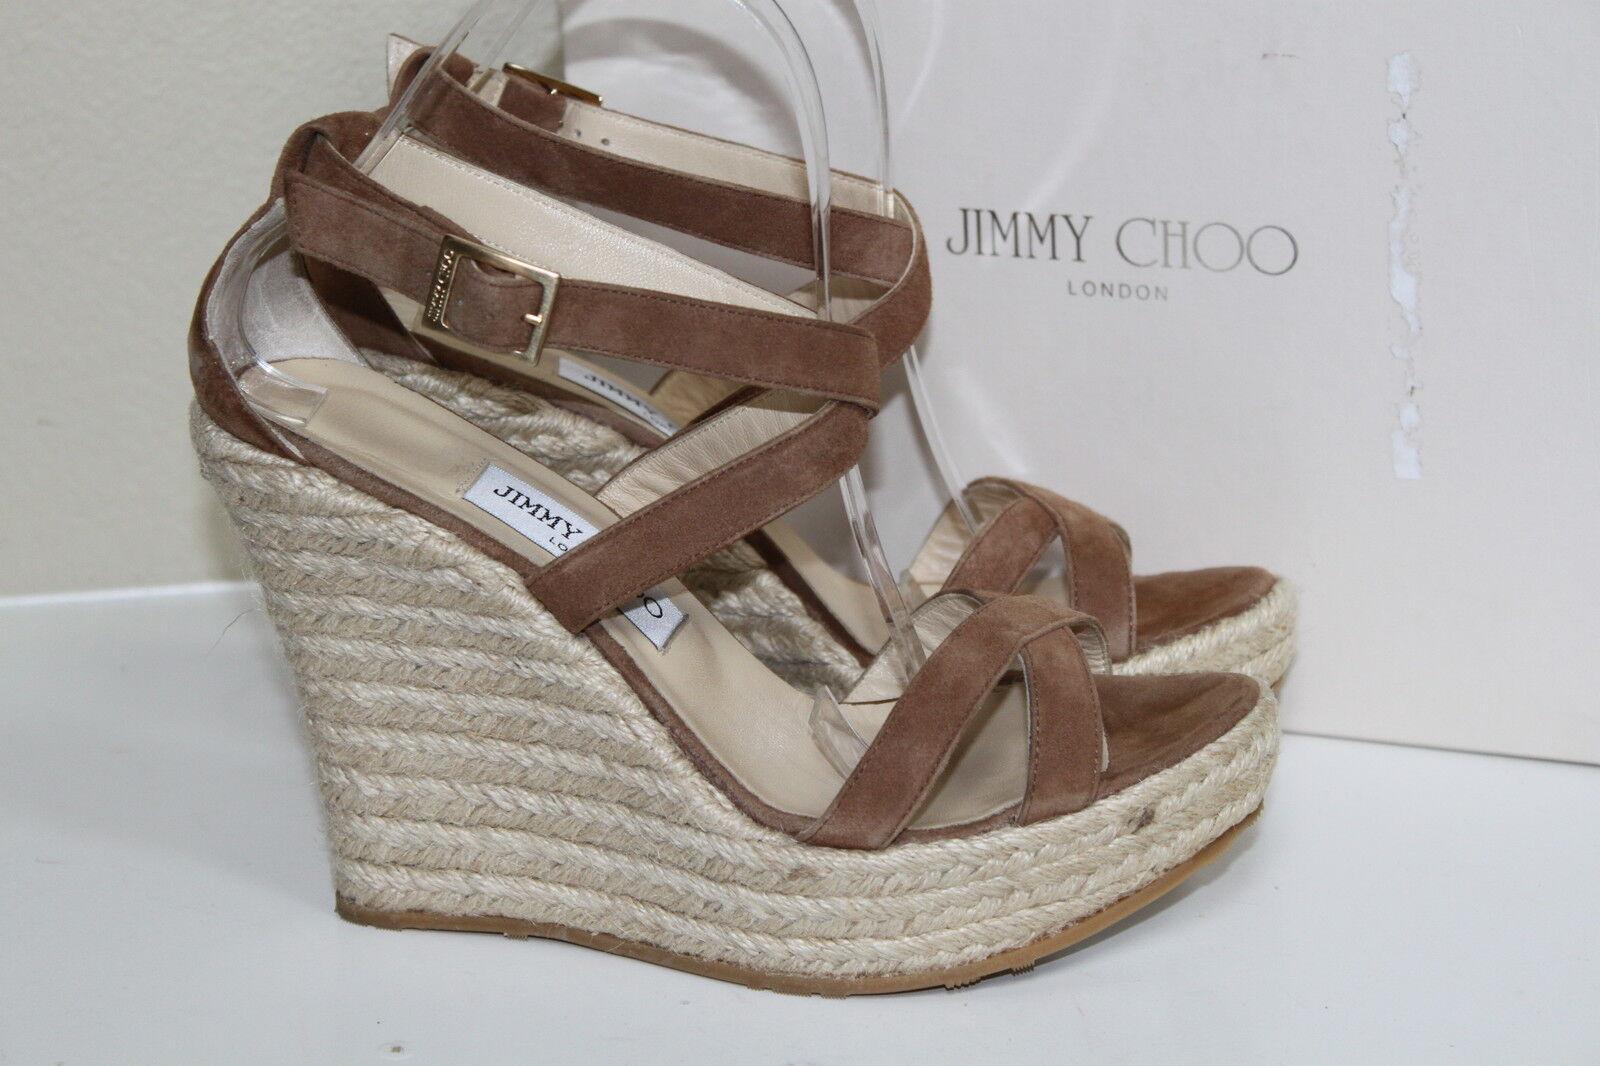 Sz 10 US   40 Jimmy Choo Porto Tan Suede Platform Espadrille Wedge Sandal shoes